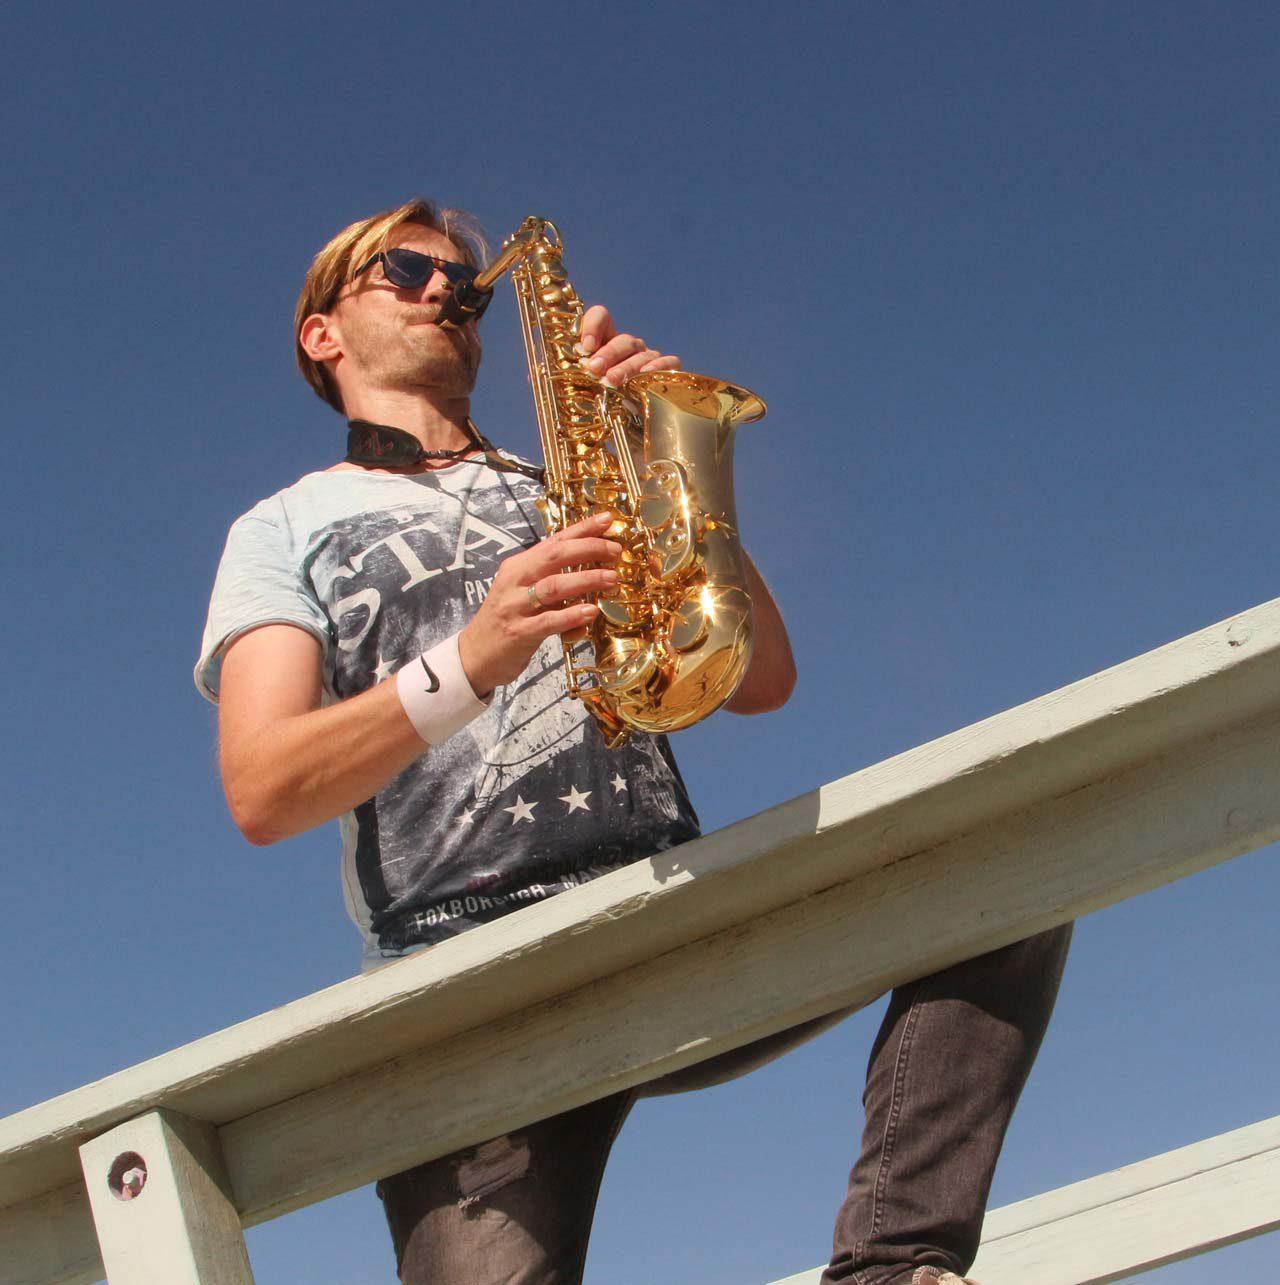 Saxophonspieler Mister Sax